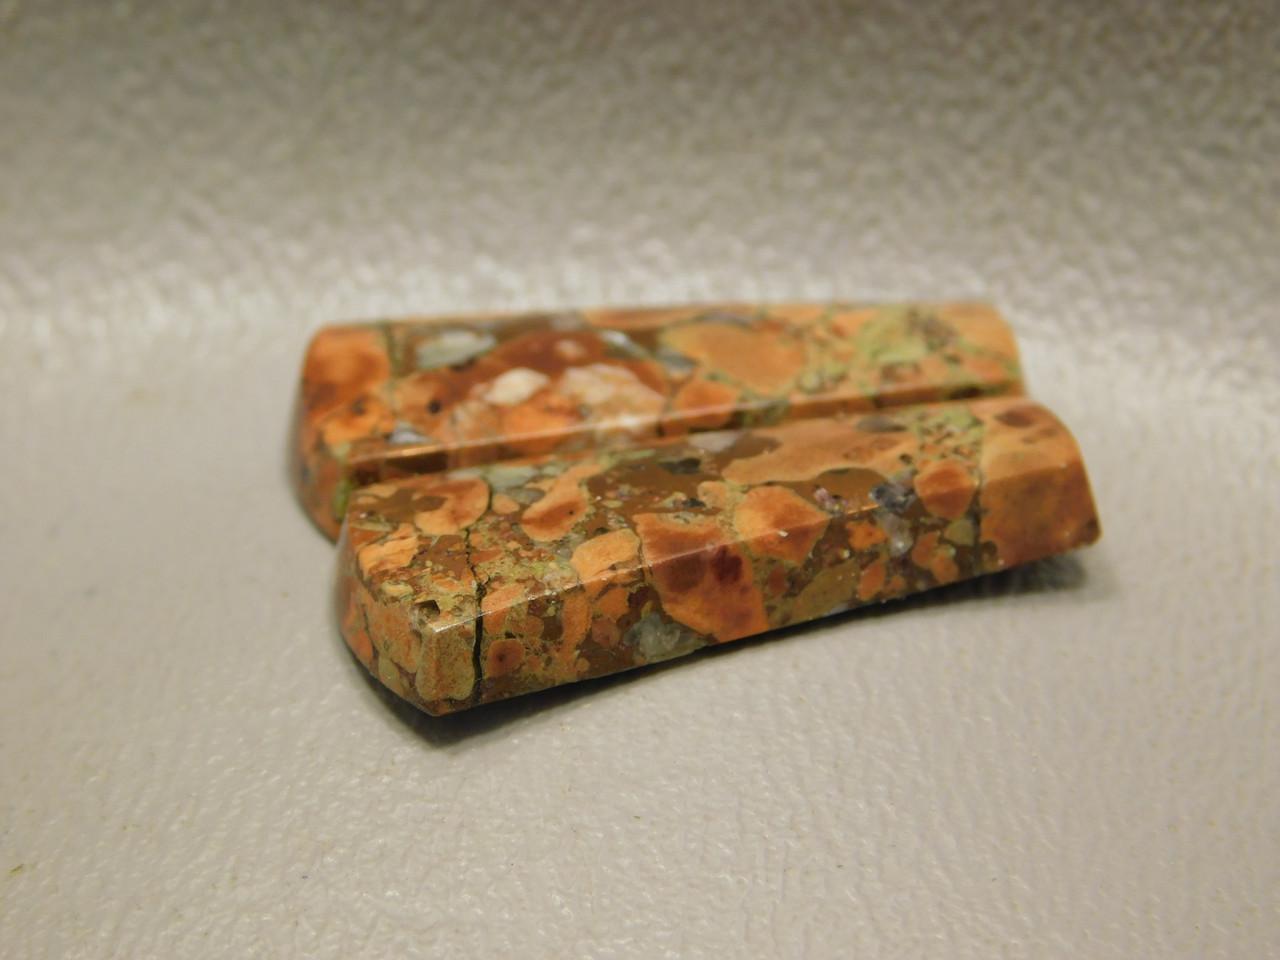 Copper Rose Semi Precious Gemstone Matched Pair Cabochons #12